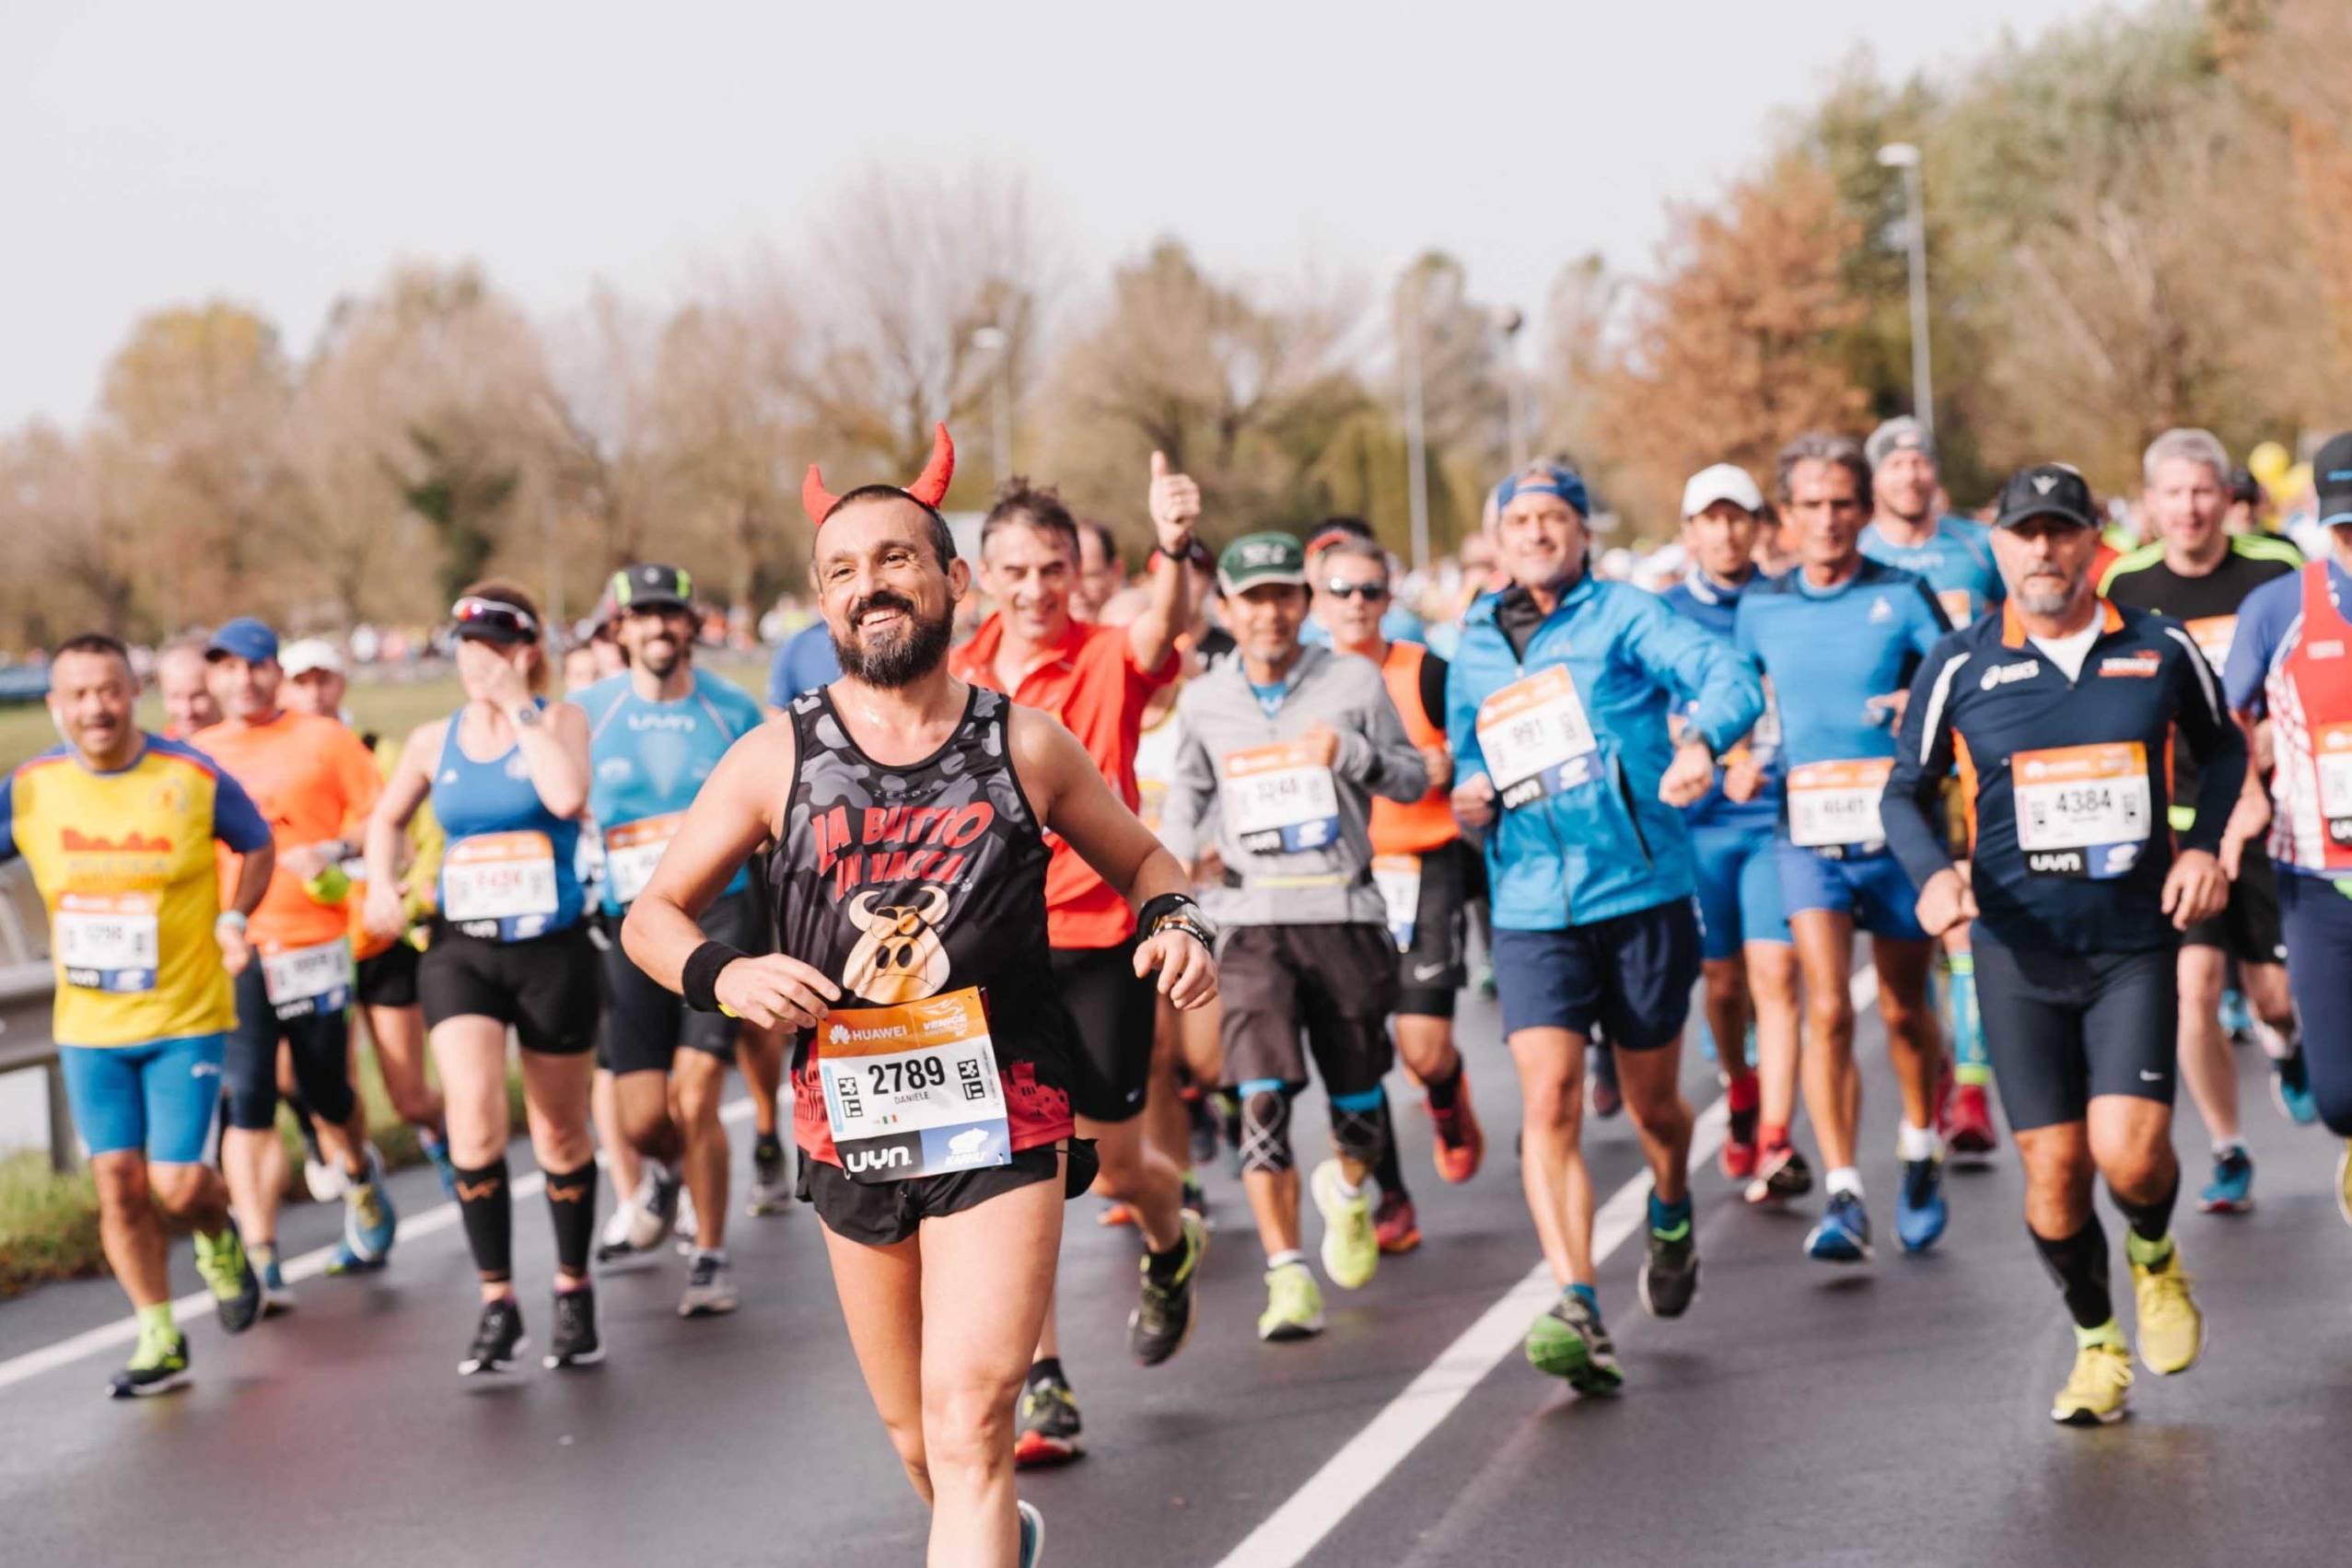 runners della maratona huawei